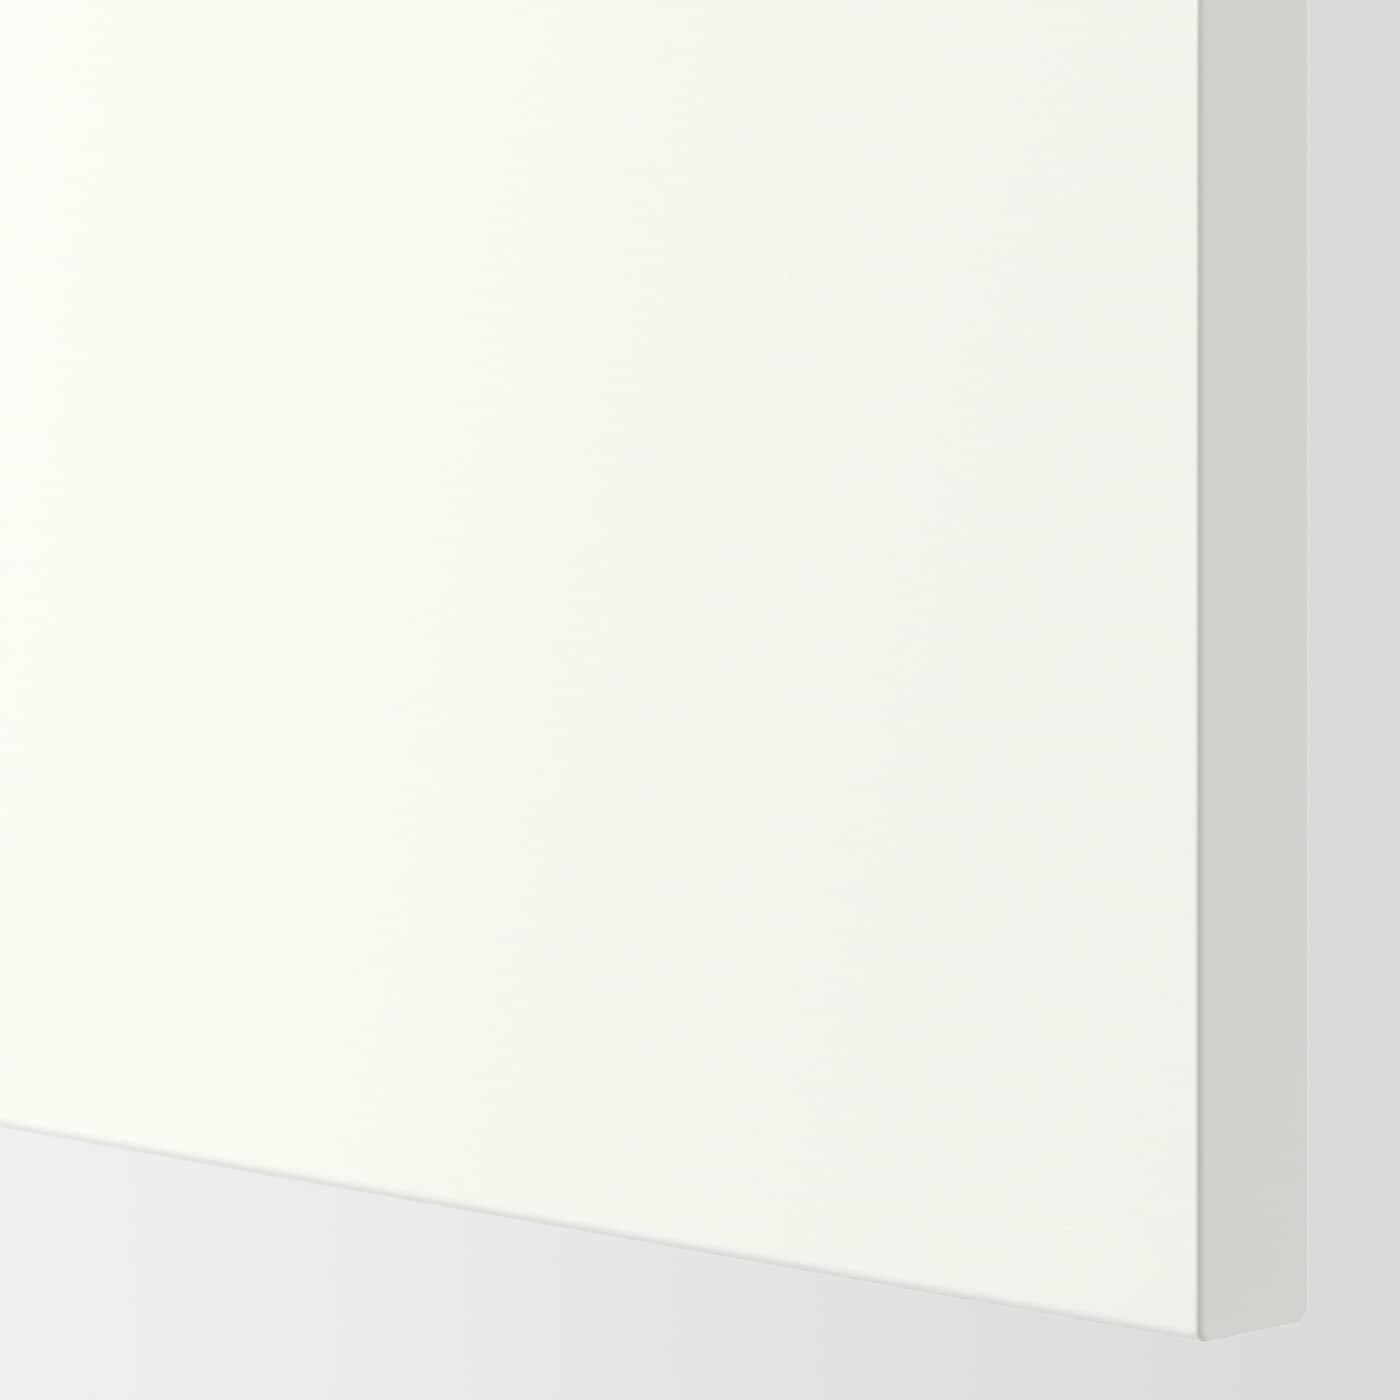 ENHET خزانة قاعدة مع رف/باب, أبيض, 60x62x75 سم